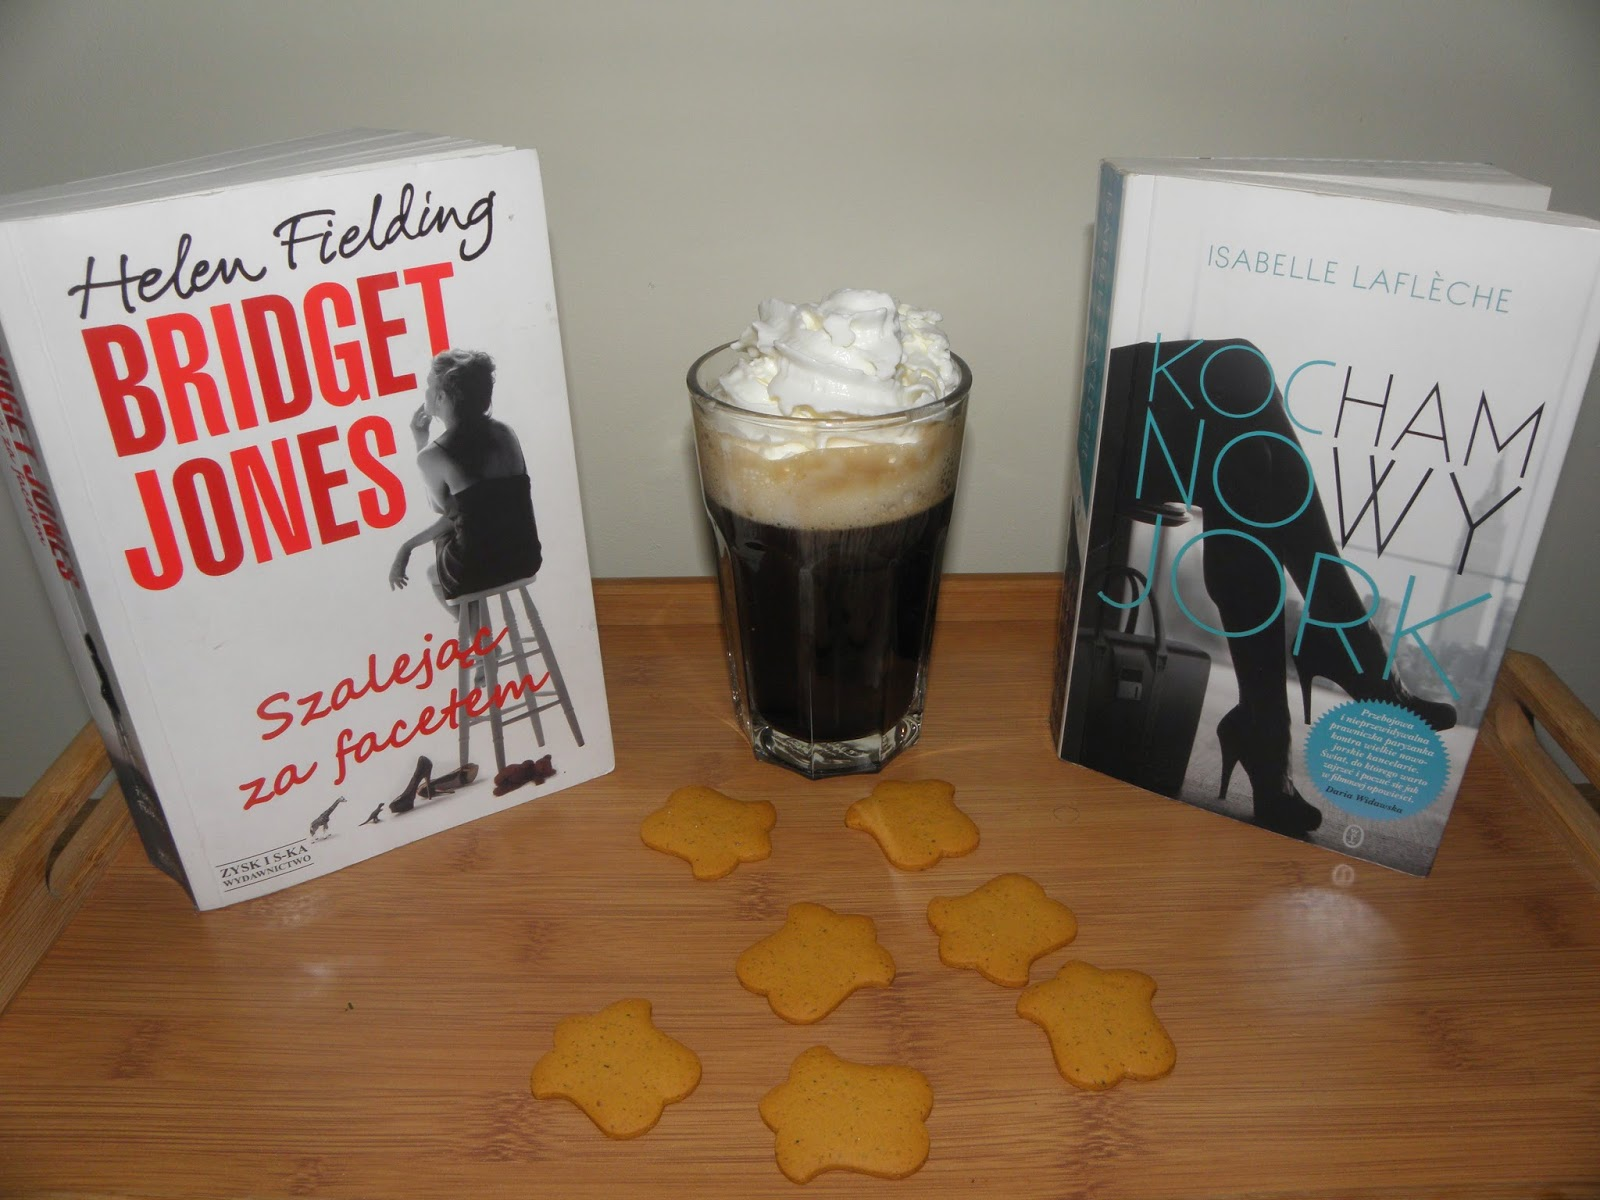 "Czytamy! Isabelle Lafleche ""Kocham Nowy Jork"" i Helen Fielding ""Bridget Jones - szalejąc za facetem"""